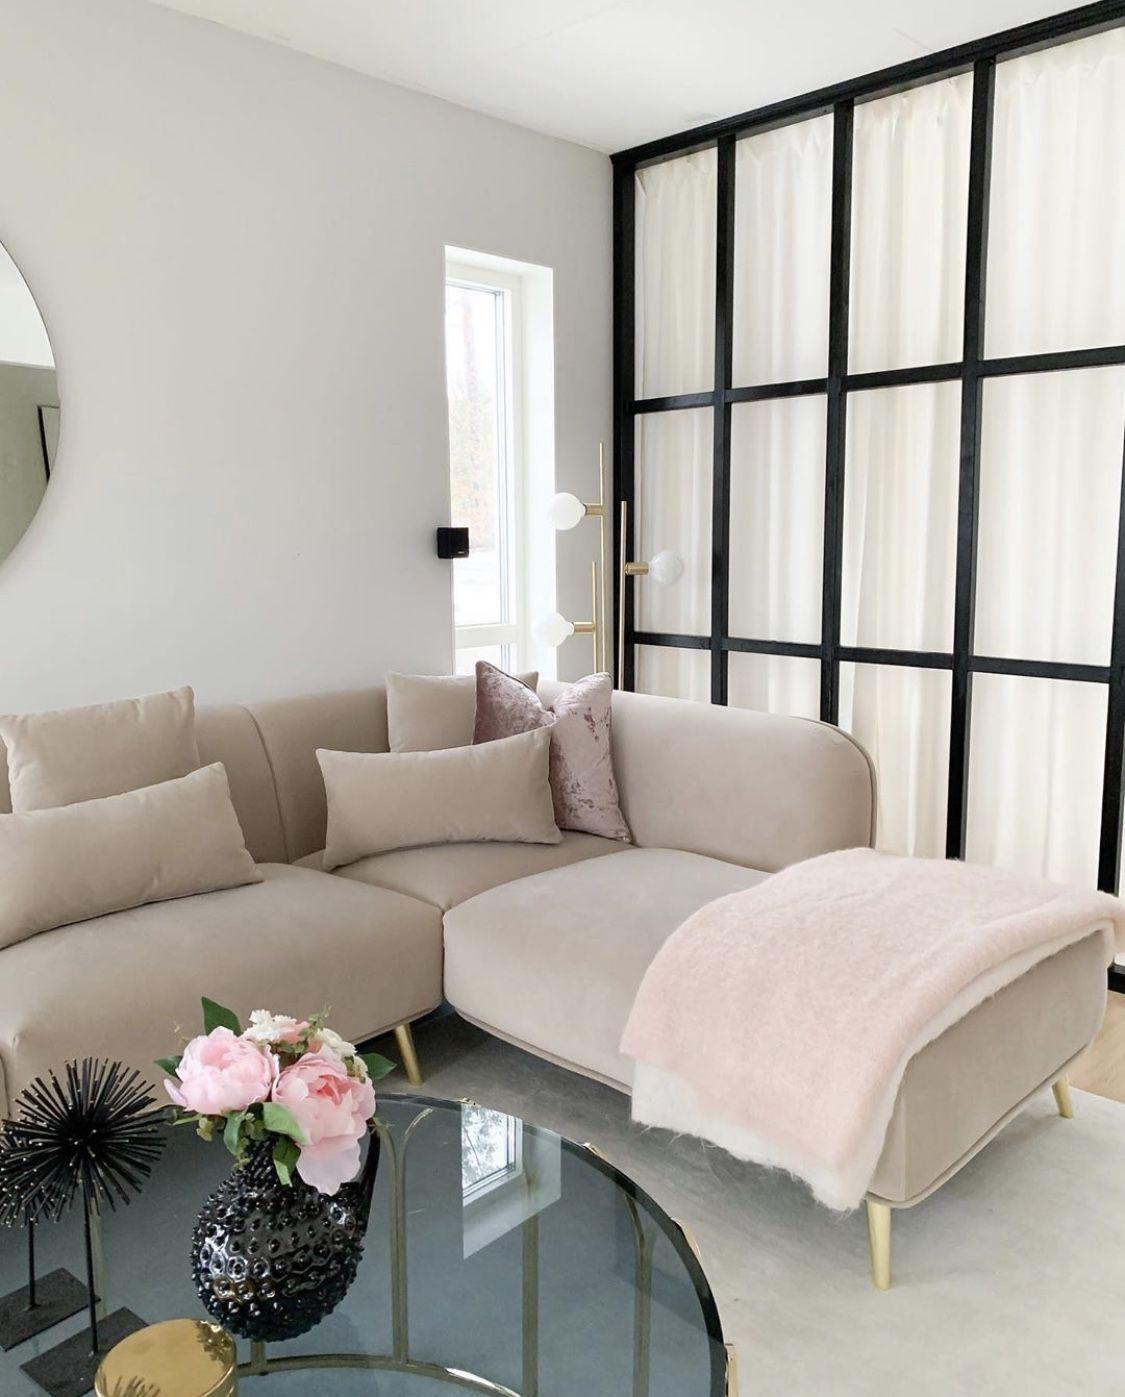 Home Tour: Vanessa Valderrama – The Marble Home Oturma Odası